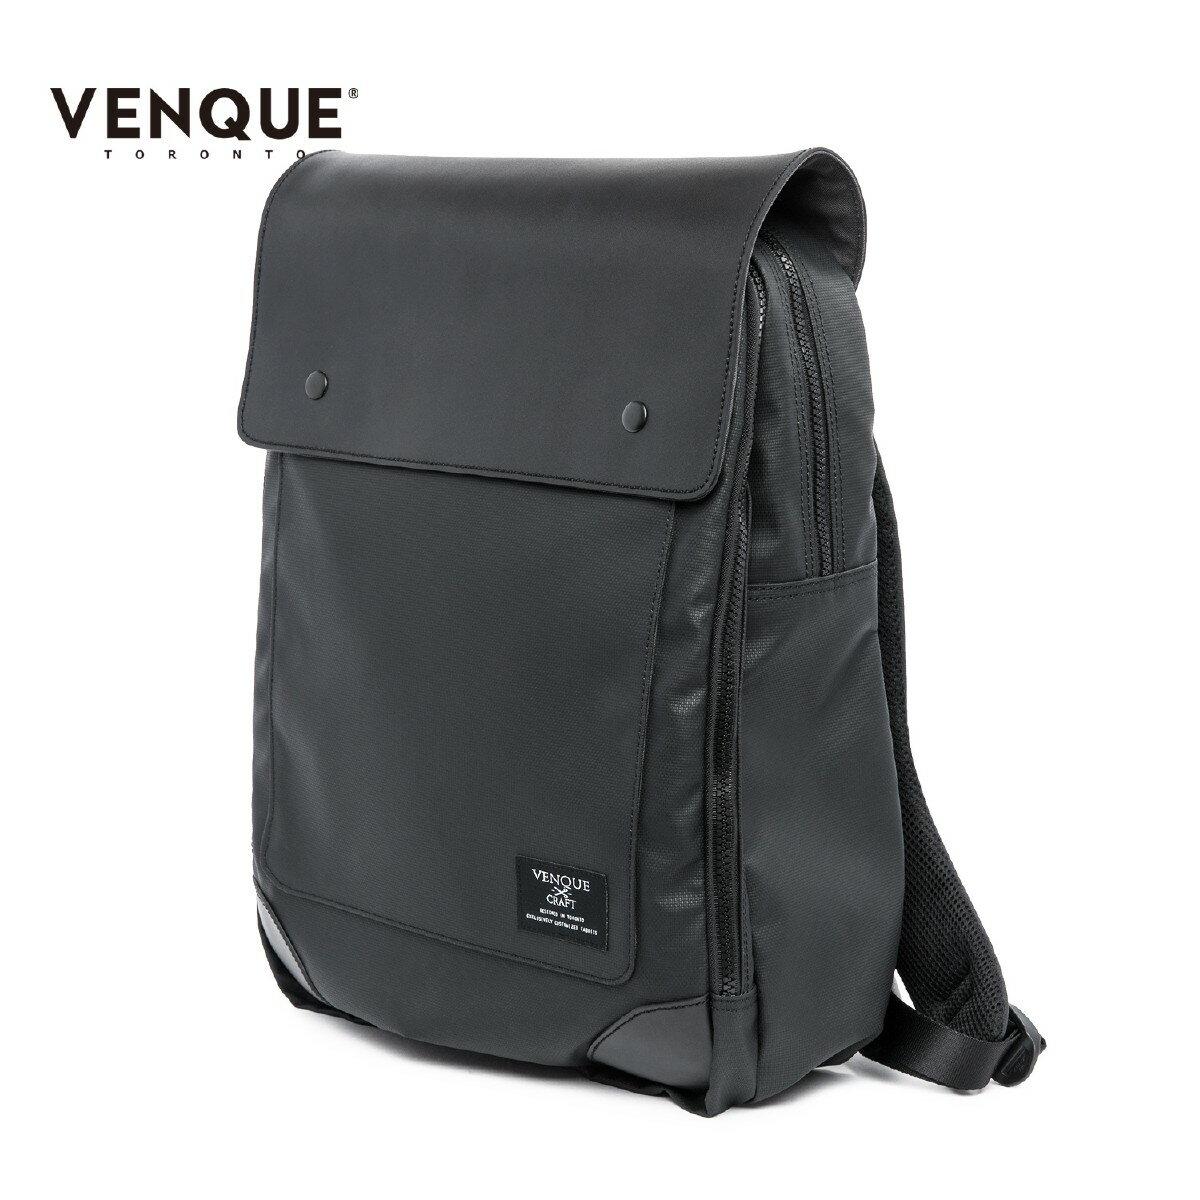 VENQUE ヴェンク Flatsquare Hyberlight バックパック メンズ/レディース ブラック OS